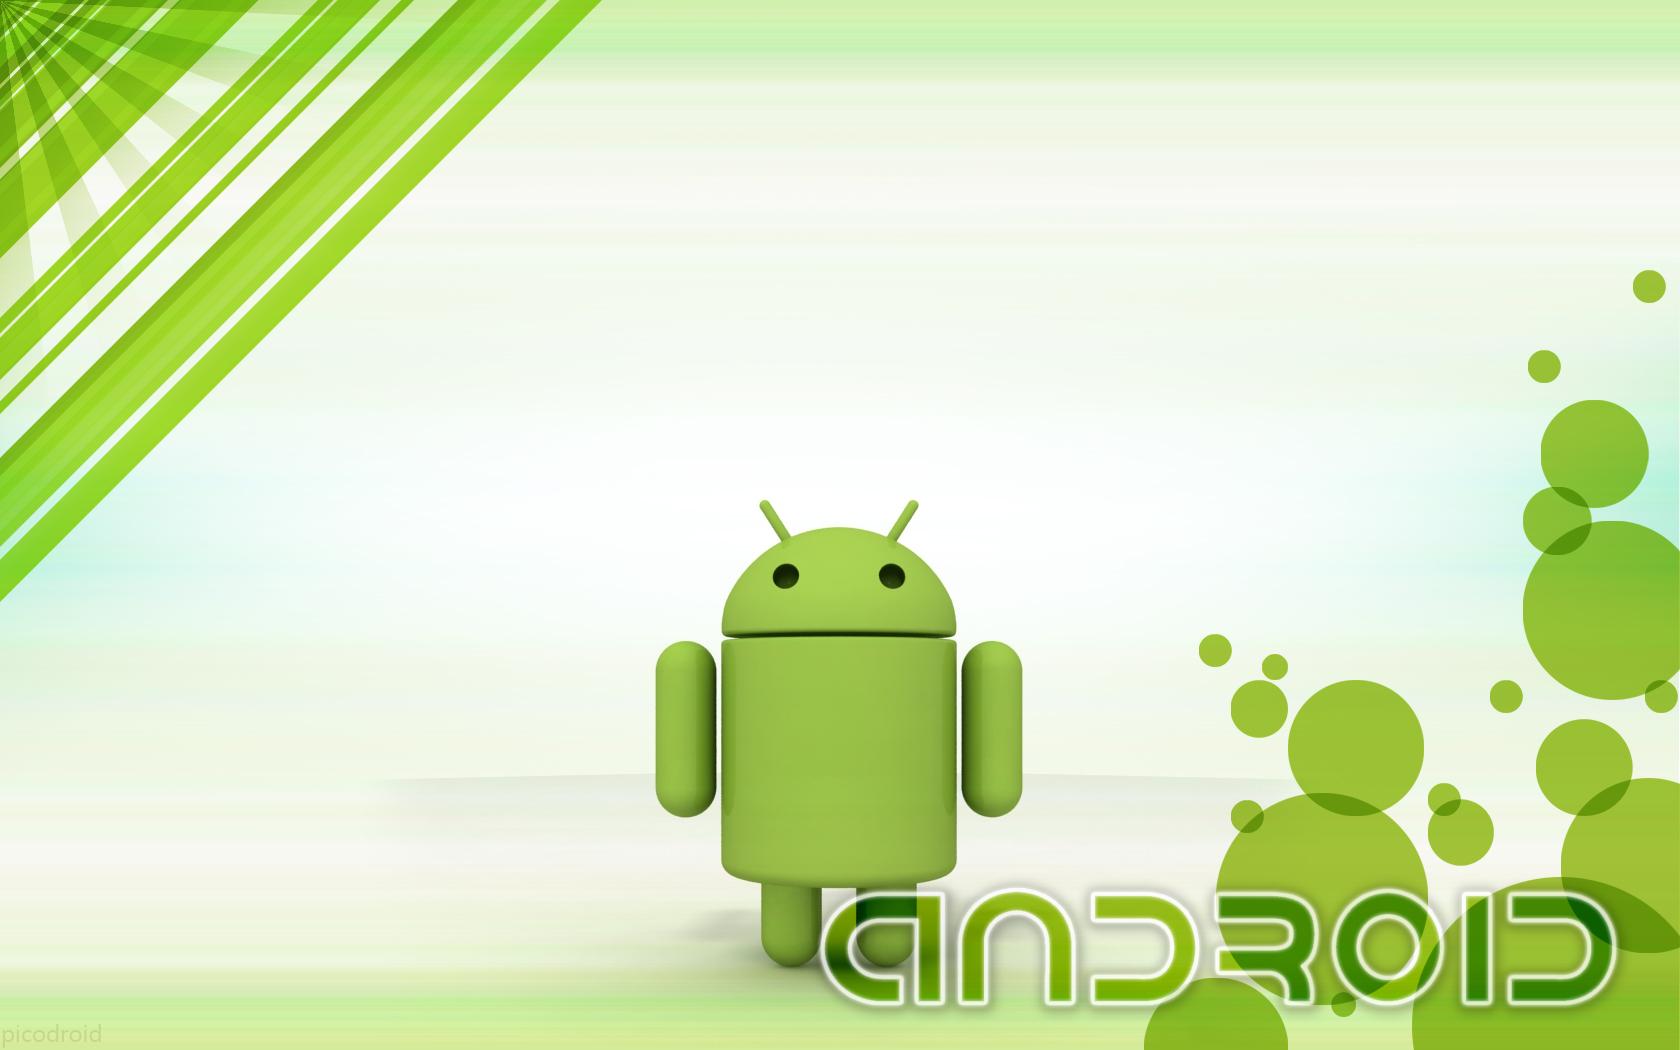 10 wallpapers para os fãs do Android 13